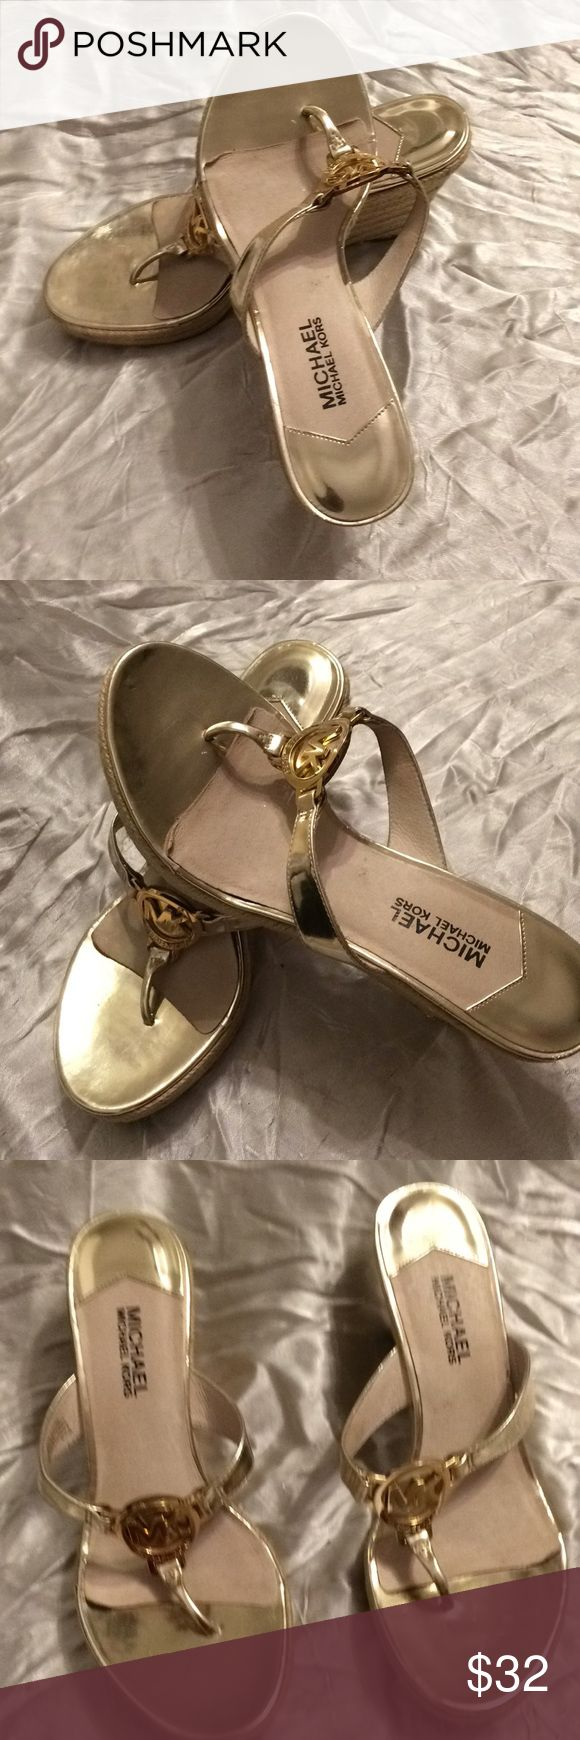 Michael Kors ladies gold wedge heel sandals size 9 Michael Kors ladies gold wedge heel sandals size 9 Vintage KORS Michael Kors Shoes Sandals